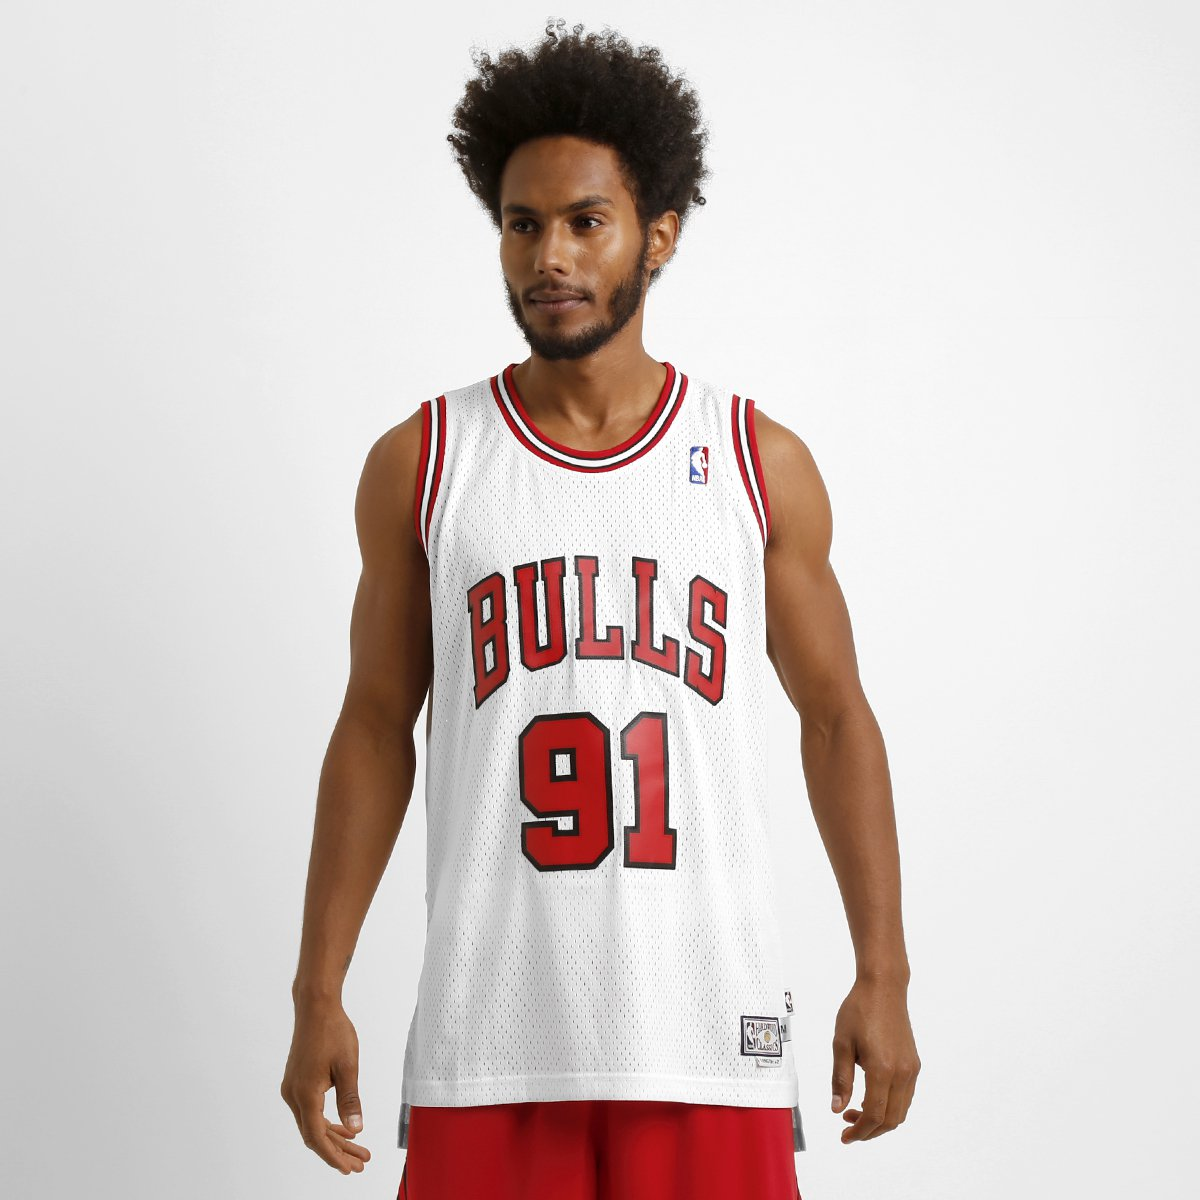 Camiseta Regata Adidas NBA Retired Chicago Bulls - Rodman - Compre Agora  d6ba449653f